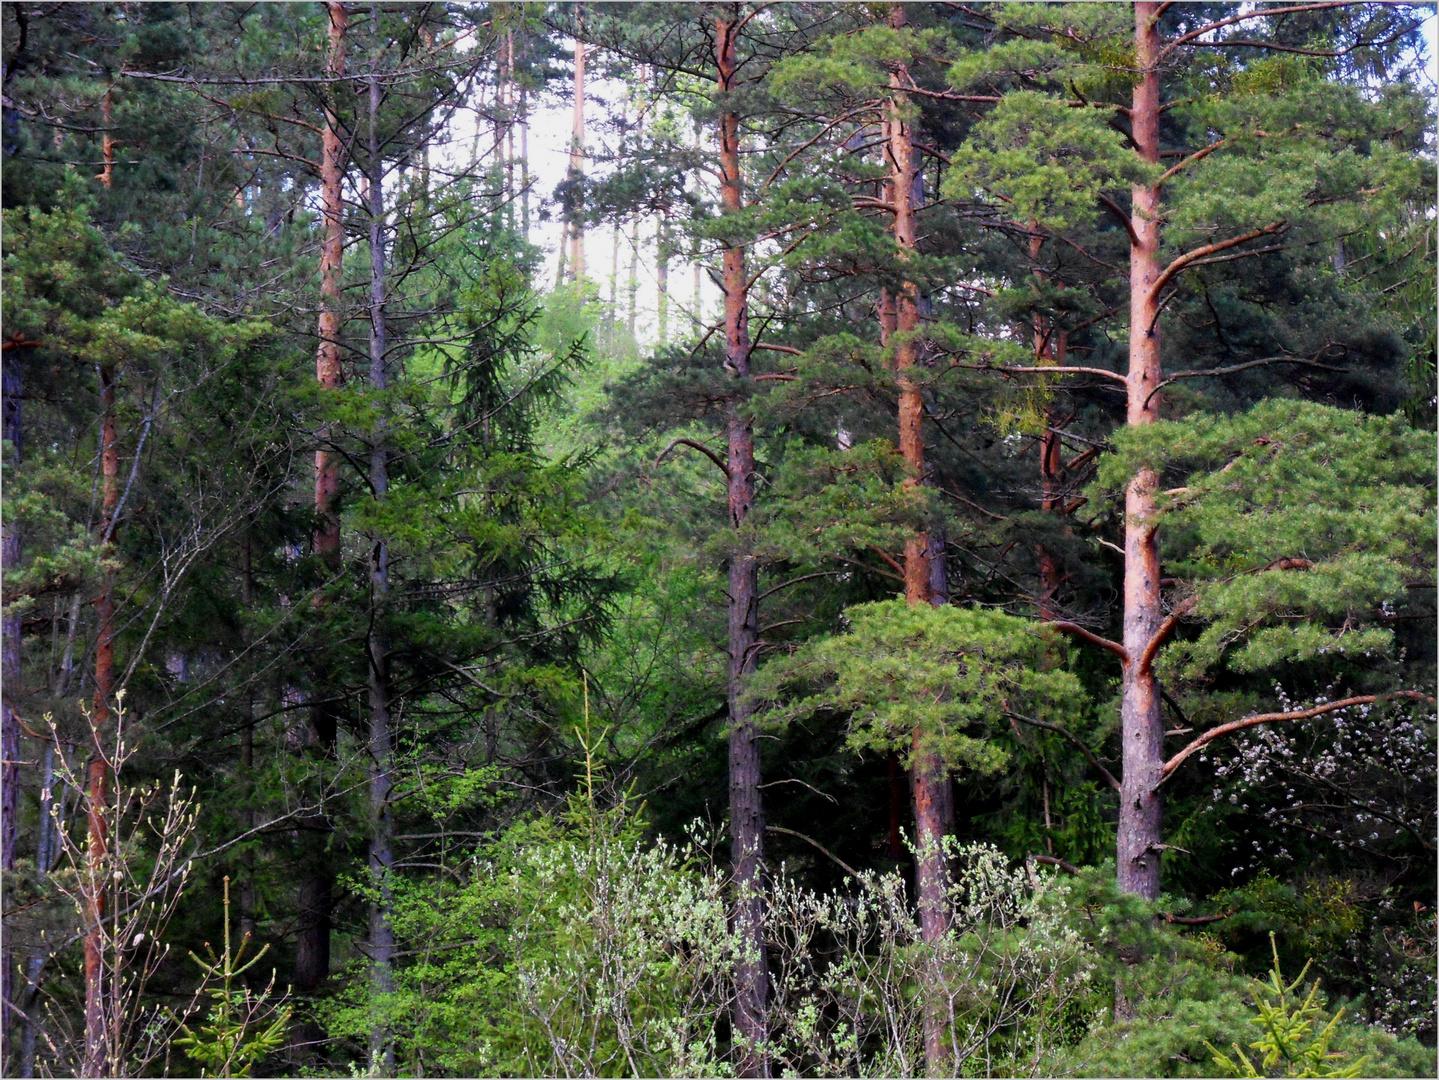 Blick in den Wald hinauf